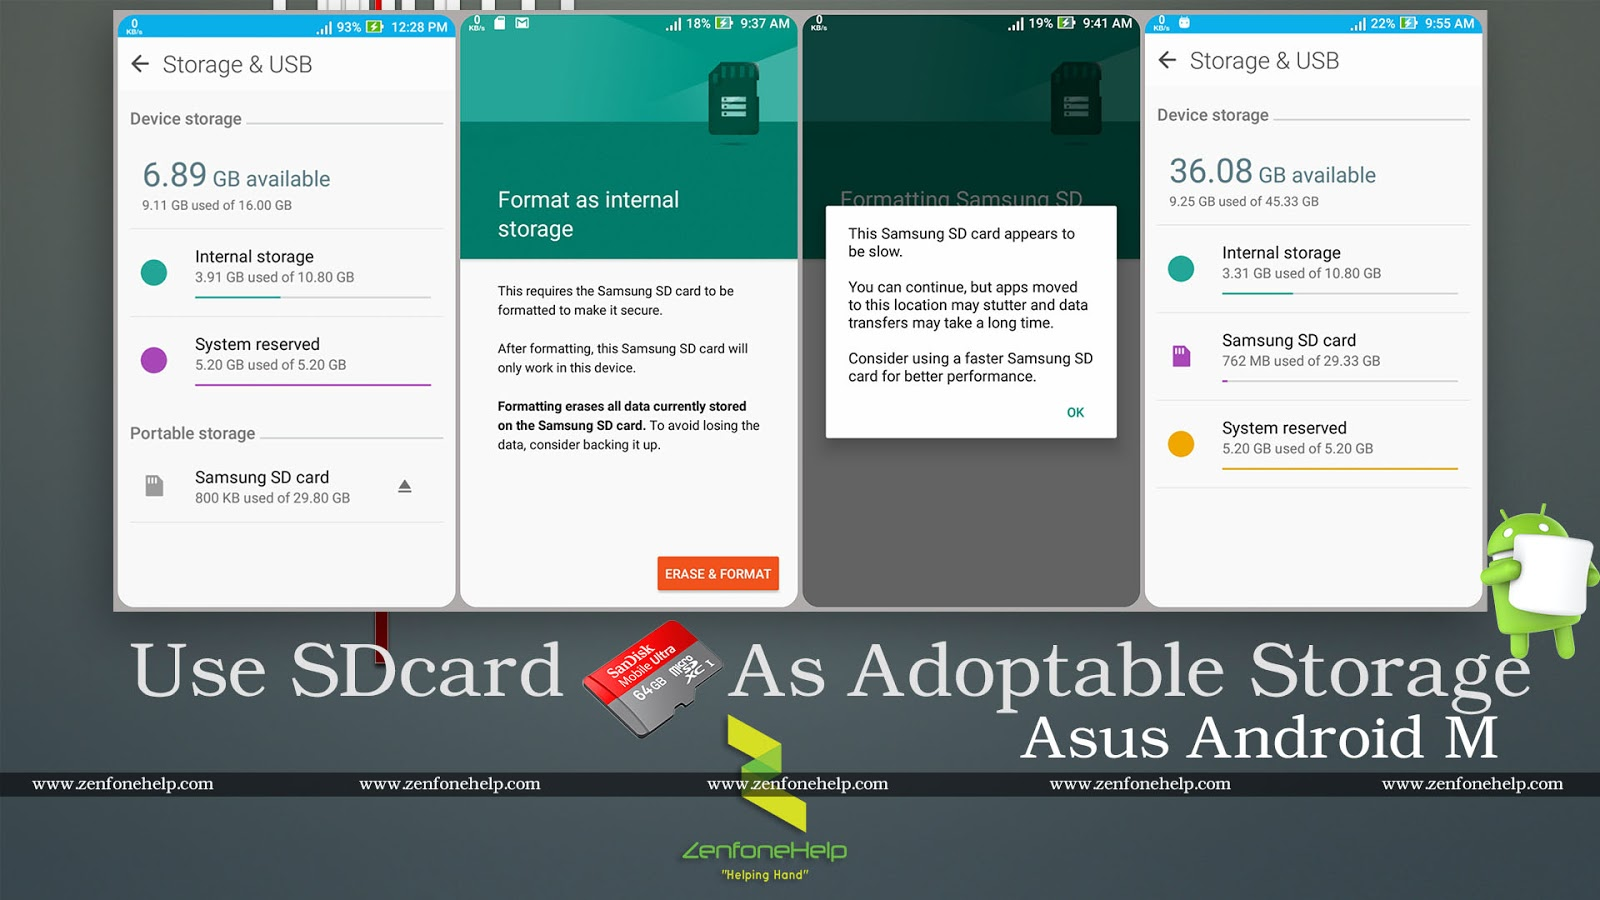 Asus Zenfone SDcard to Adoptable Storage   ZenFone Help